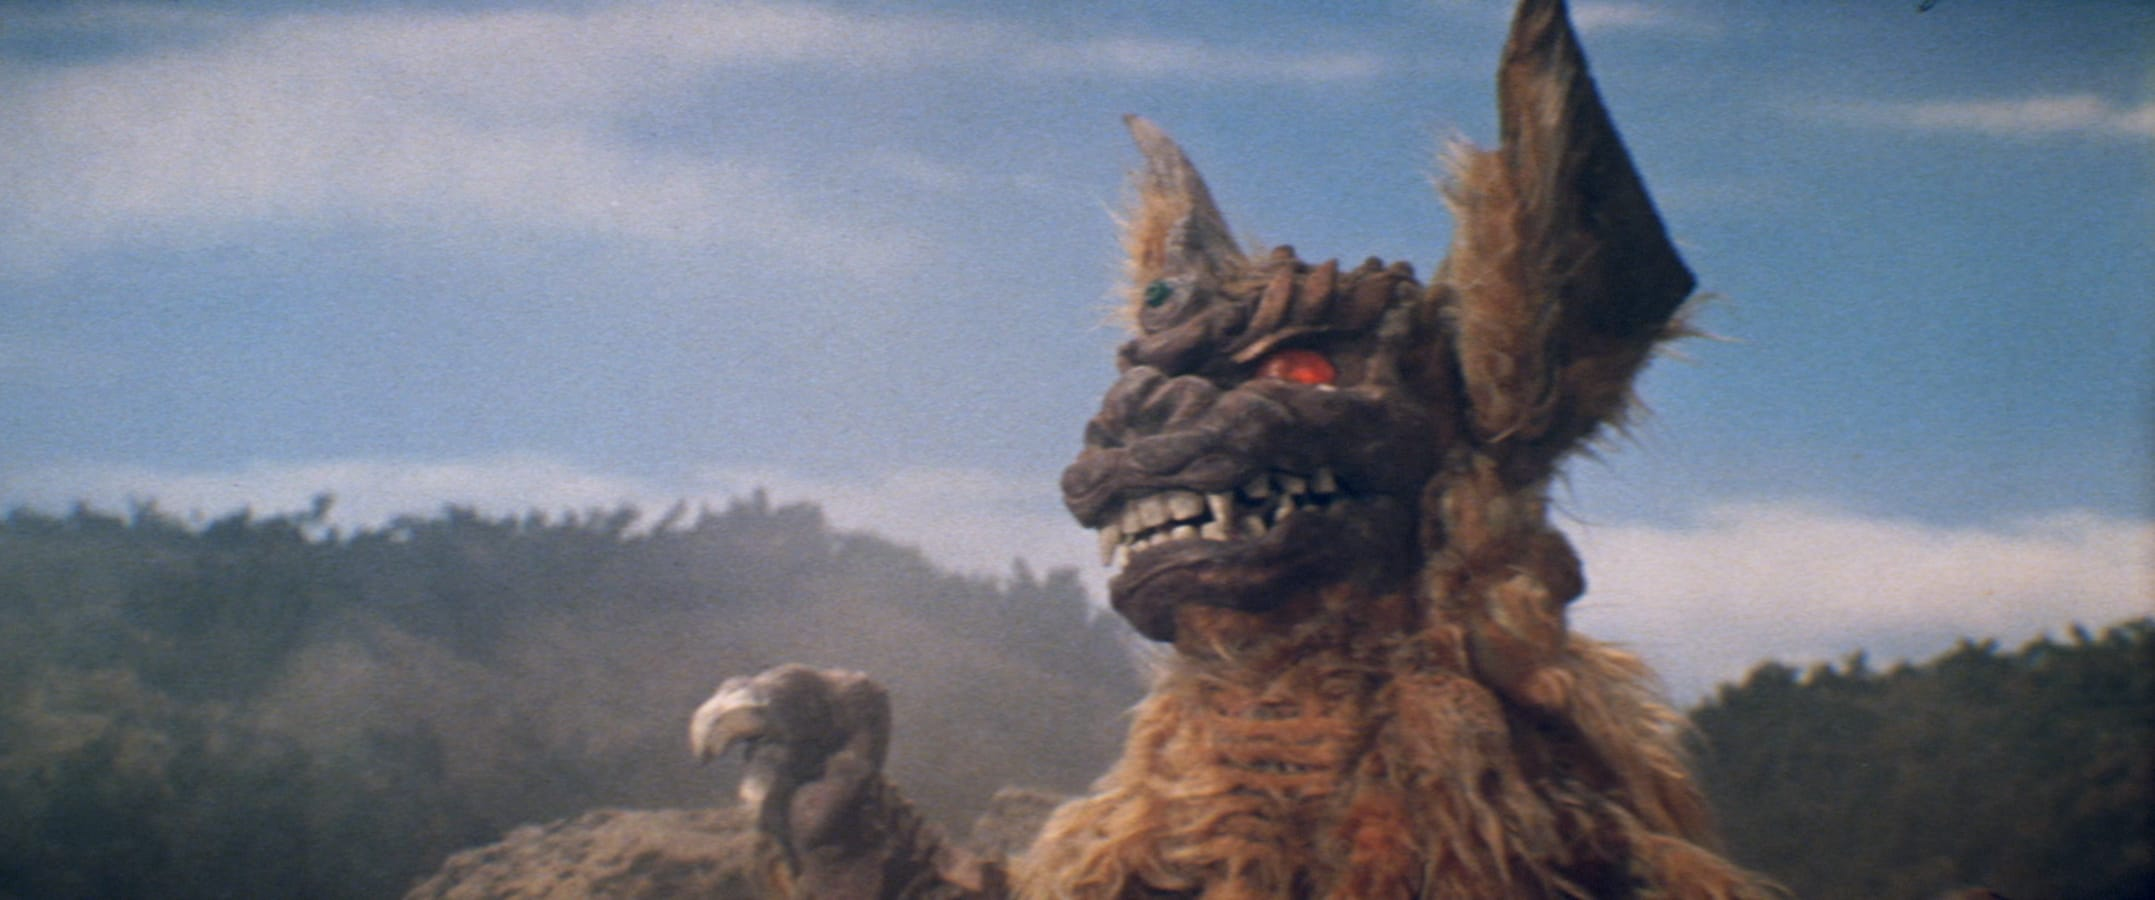 Godzilla vs. Mechagodzilla (1974)   The Criterion Collection